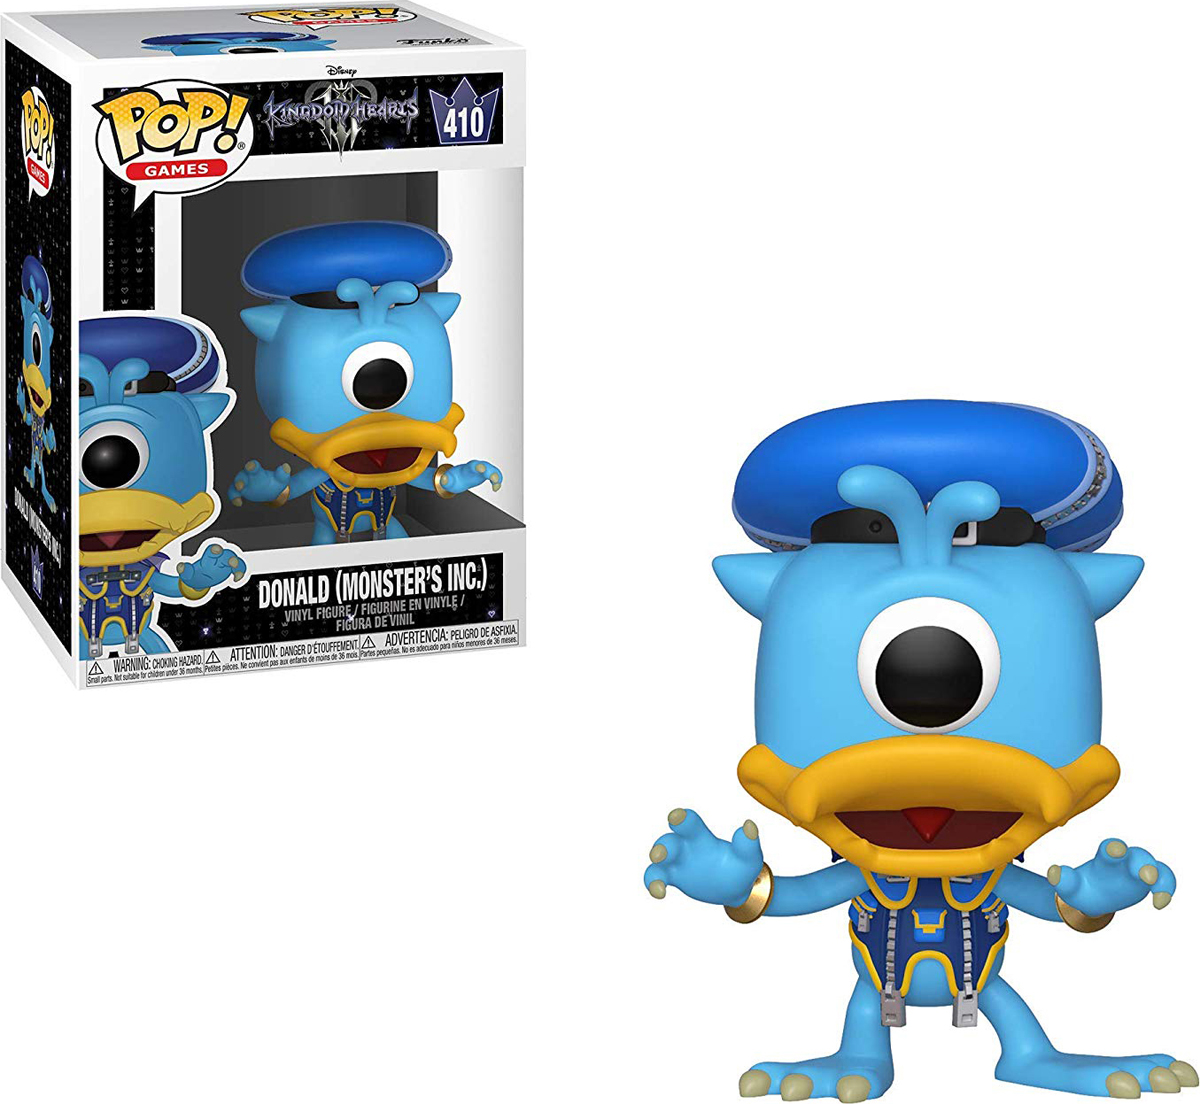 Фигурка Funko POP! Vinyl: Games: Kingdom Hearts 3: Donald (Monsters Inc.) 34059 фигурка funko pop vinyl games kingdom hearts 3 sora monster s inc 34057